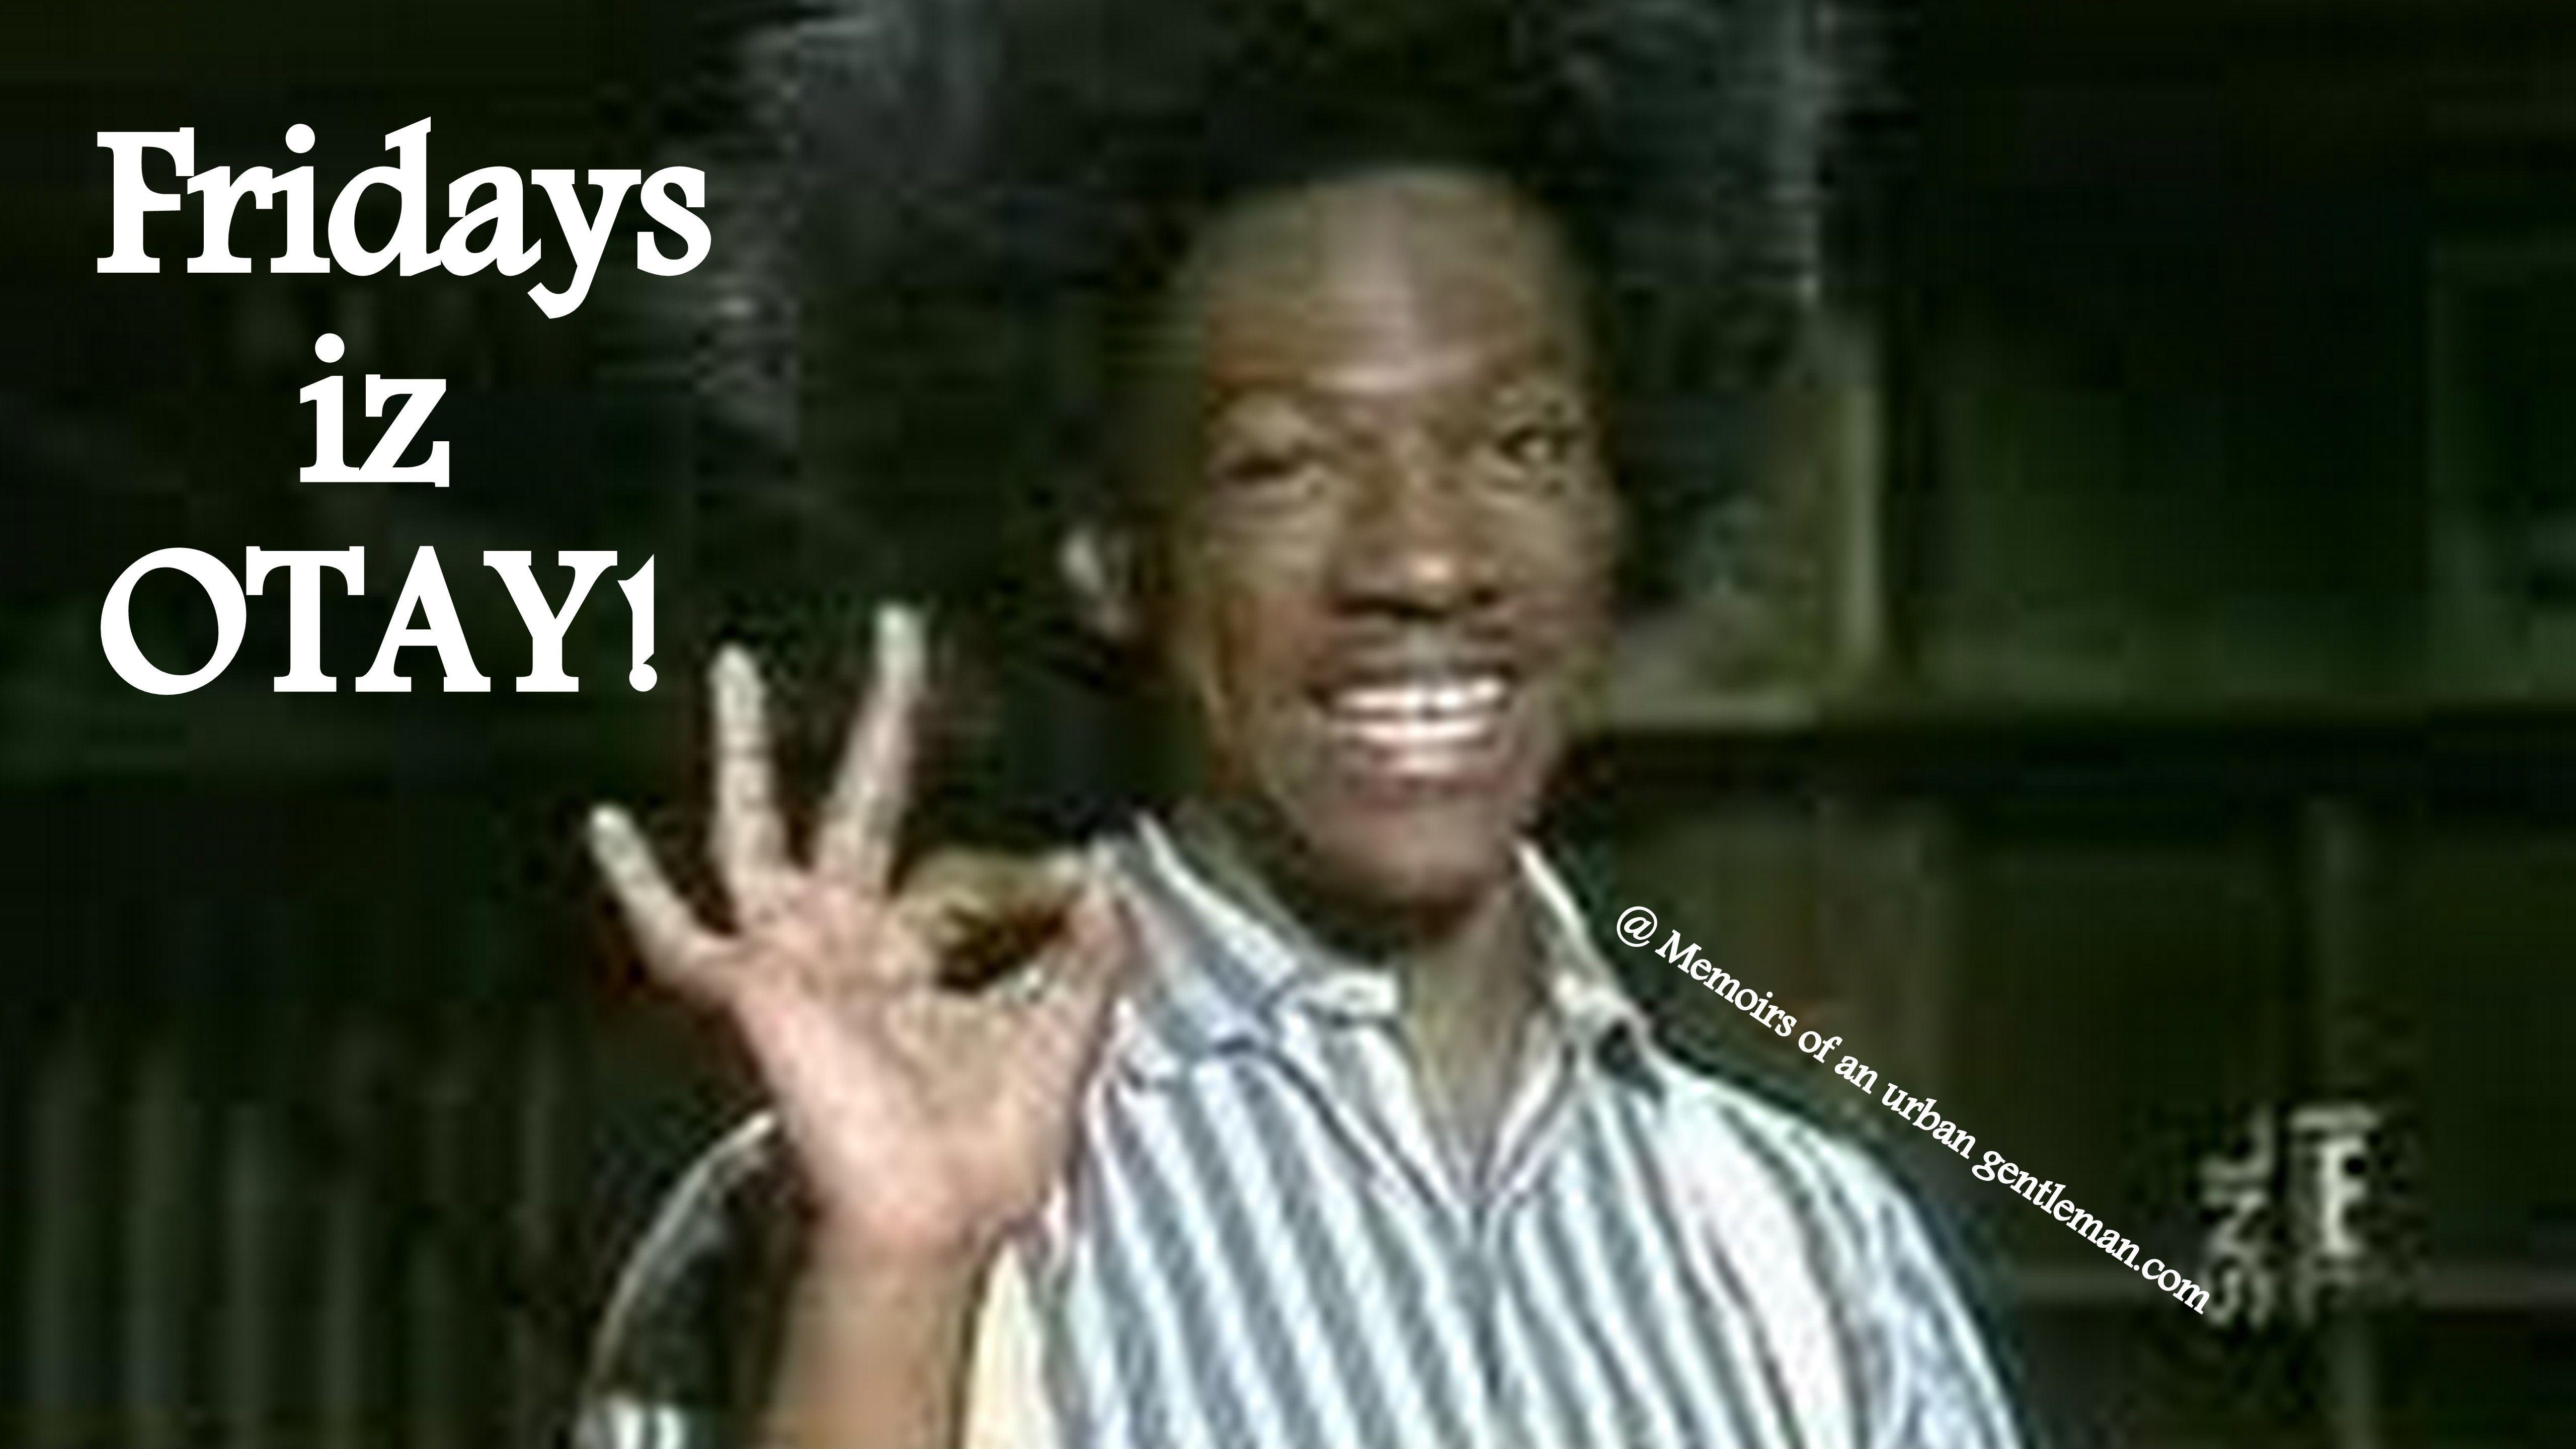 Funny Meme Its Friday : It's friday text buckwheat http: memoirsofanurbangentleman.com its